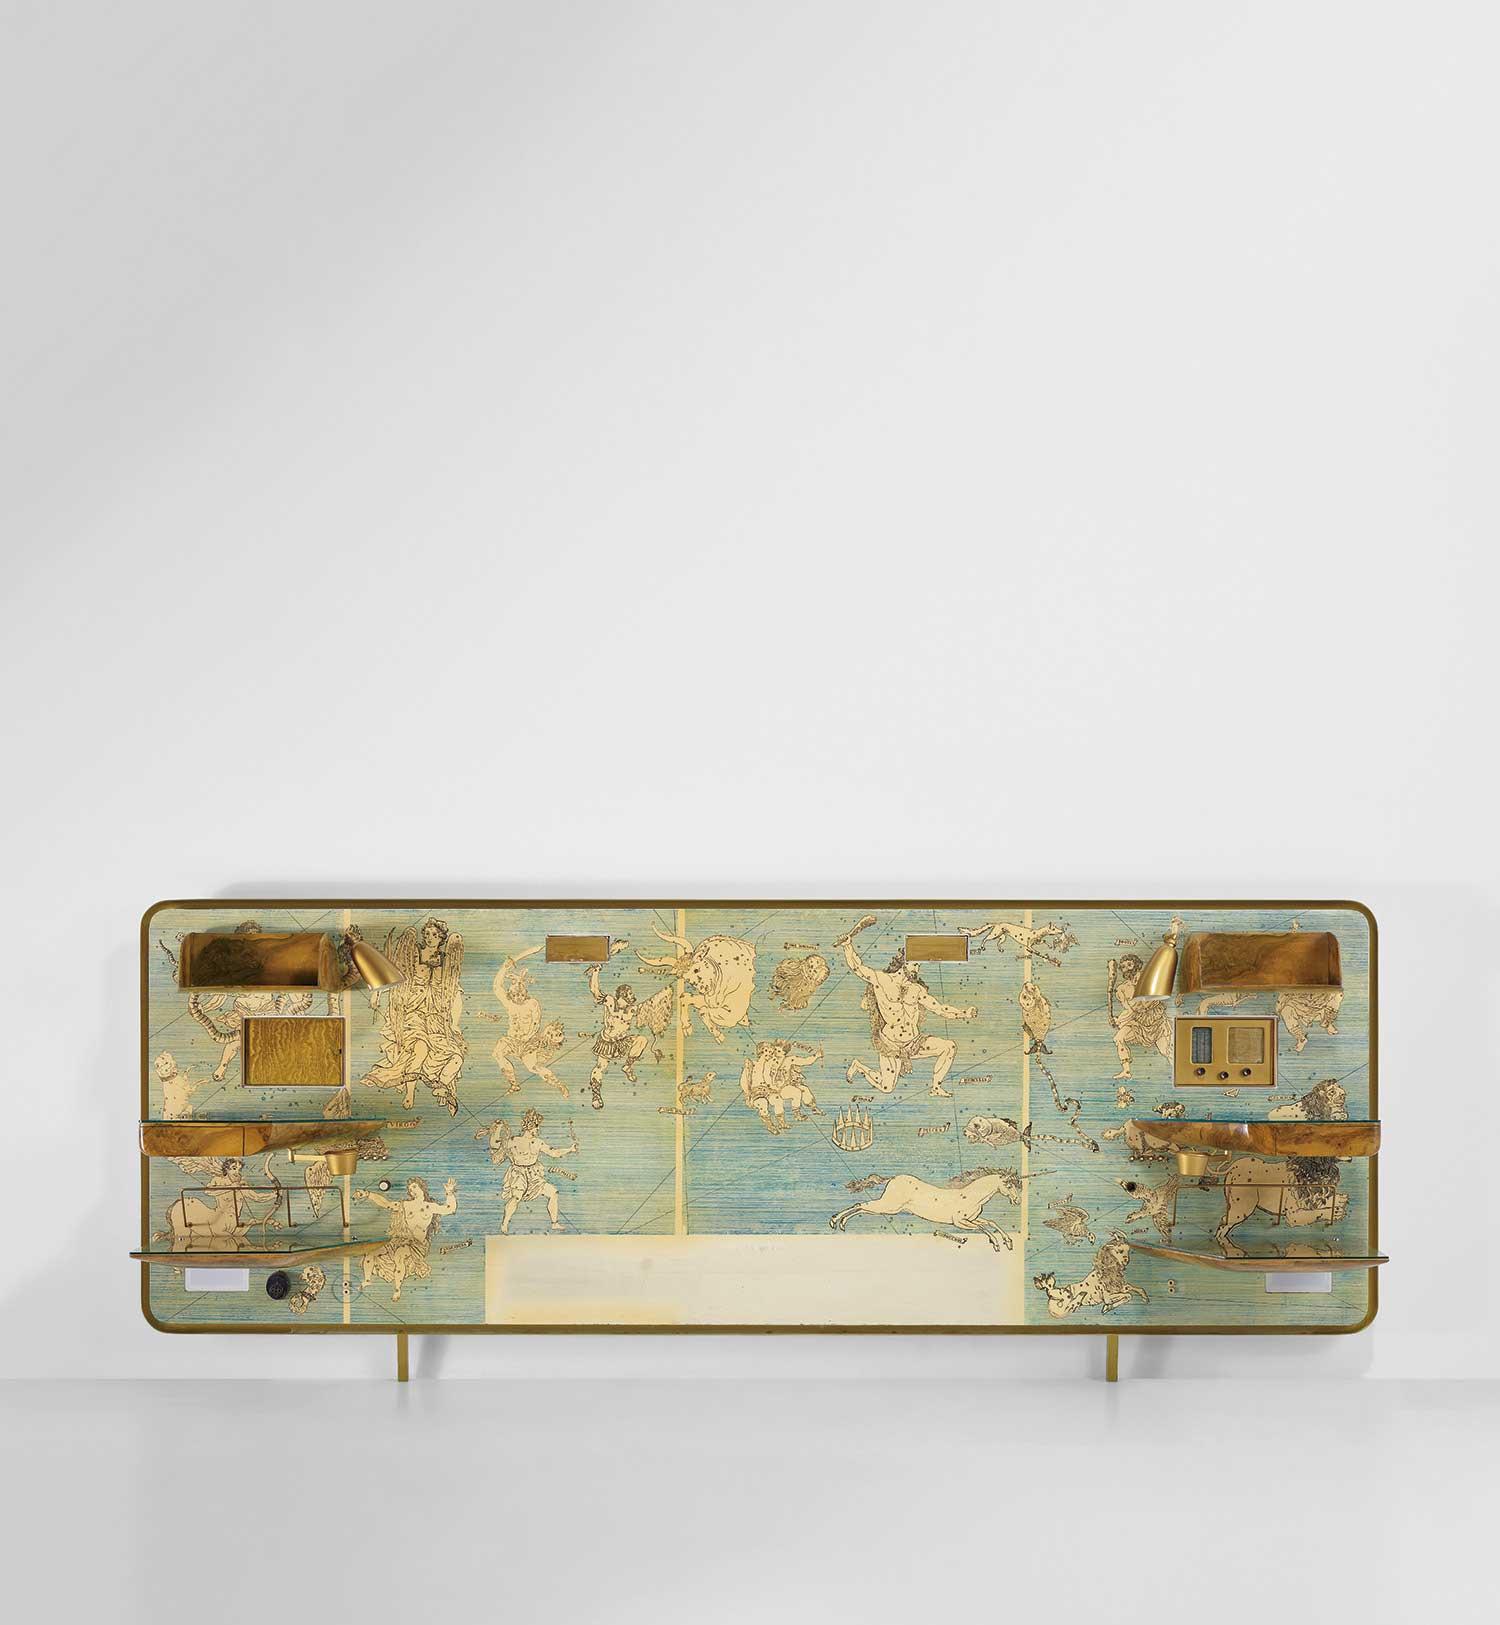 Gio-Ponti-and-Piero-Fornasetti_Rare-illuminated-headboard,-circa-1952.jpg